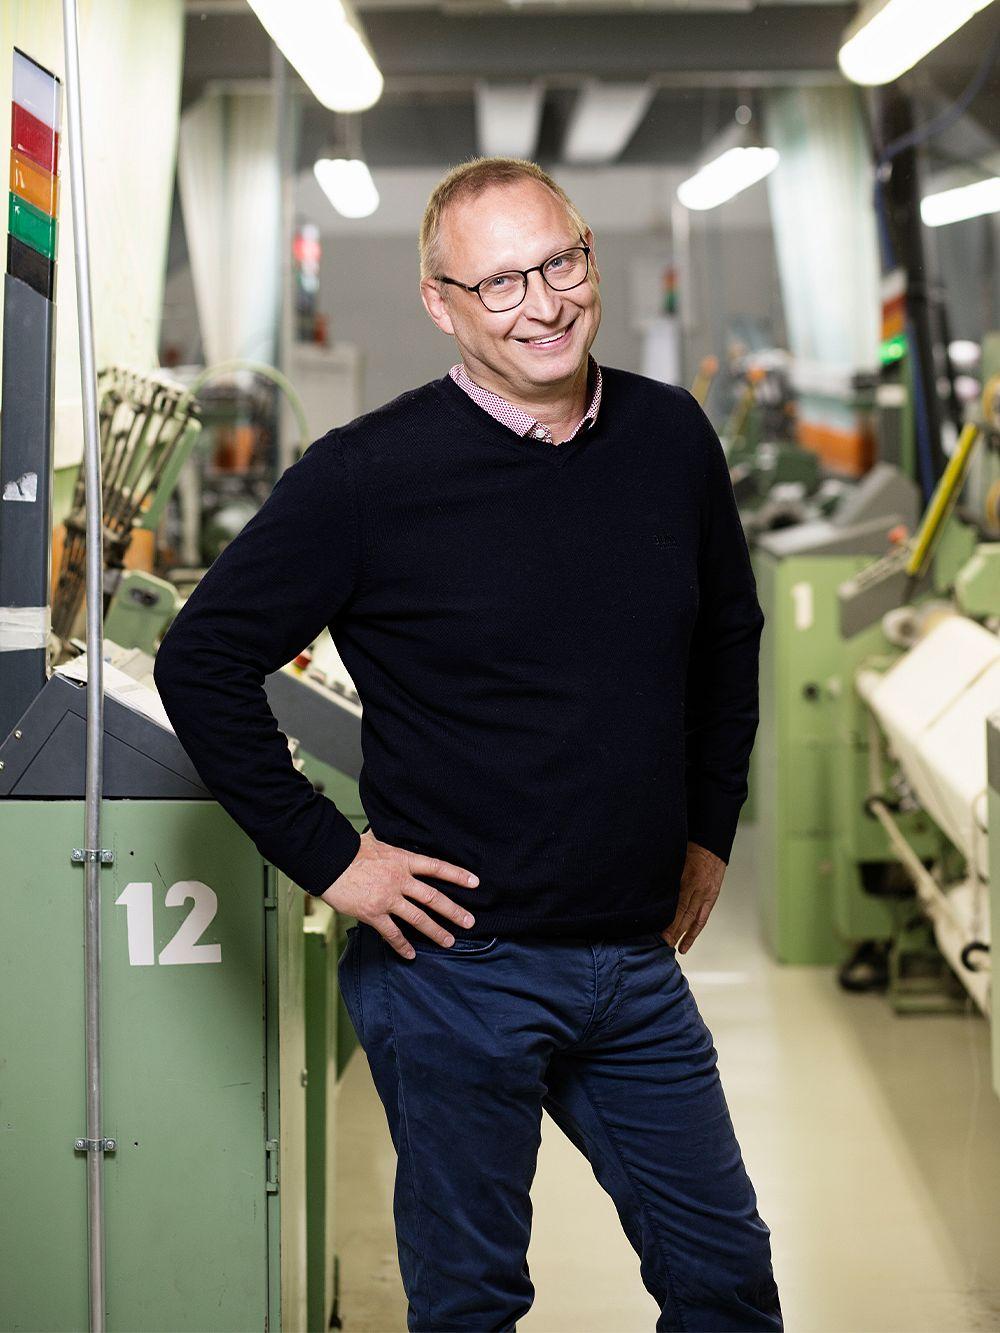 Esko Hjelt of Lapuan Kankurit